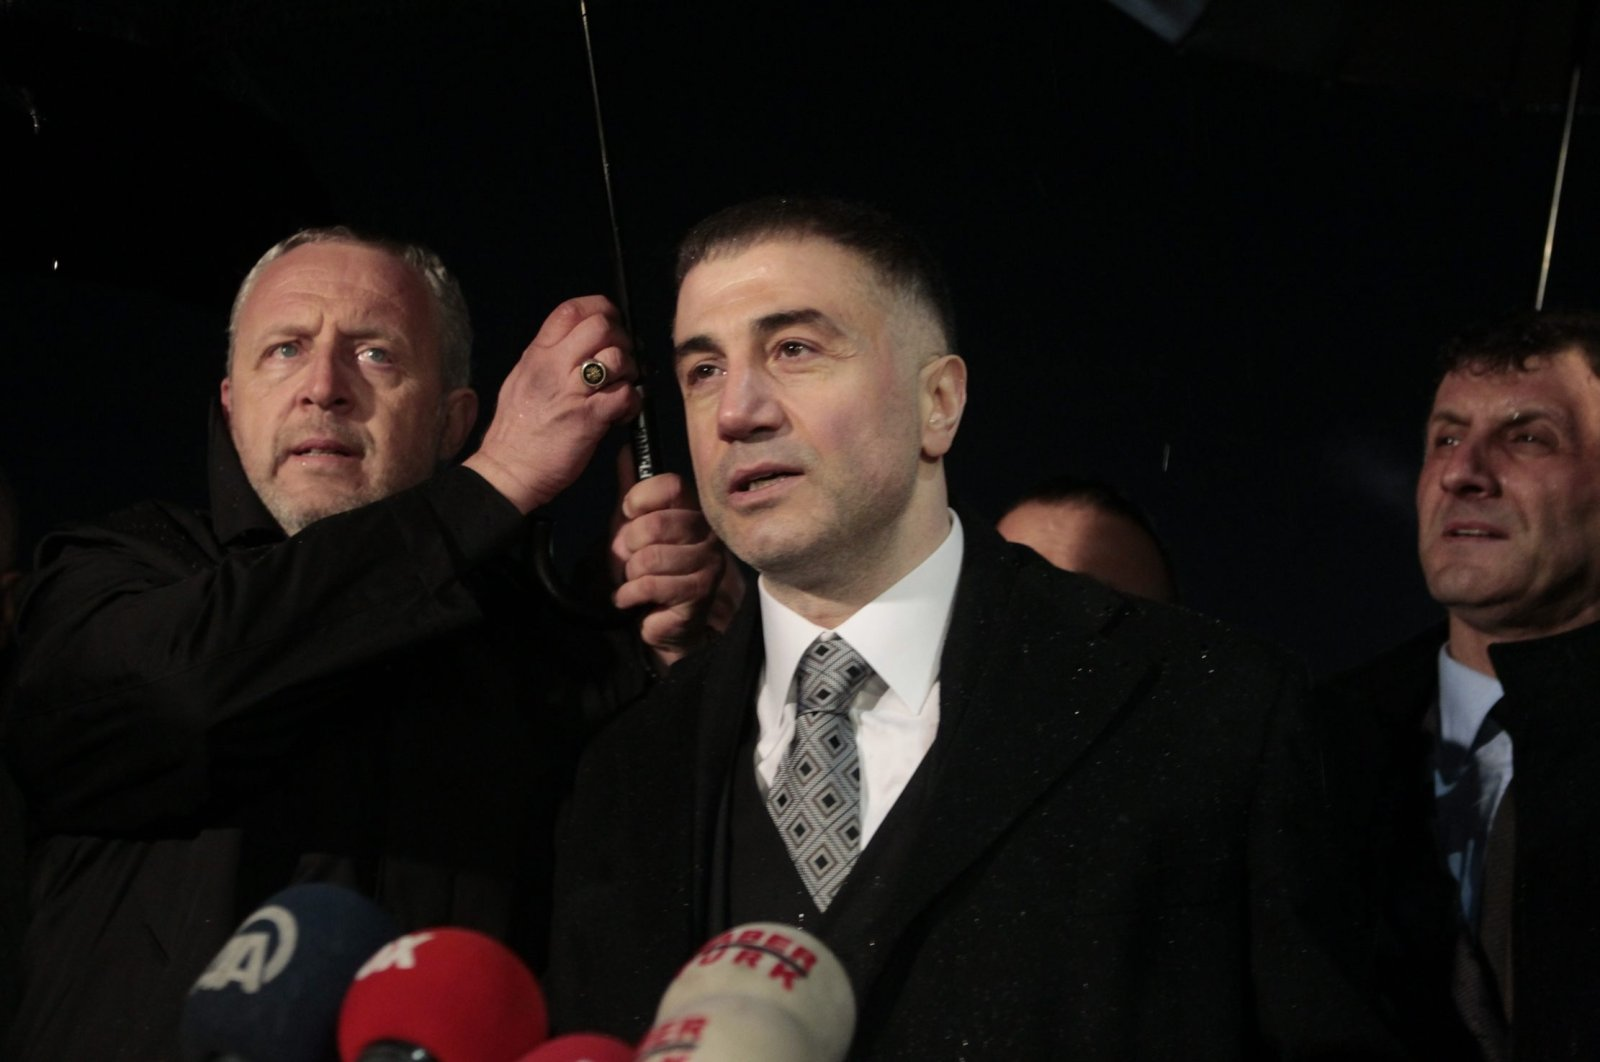 Sedat Peker talks to reporters as he leaves prison, in Istanbul, Turkey, March 10, 2014. (PHOTO BY METIN ARABACI)